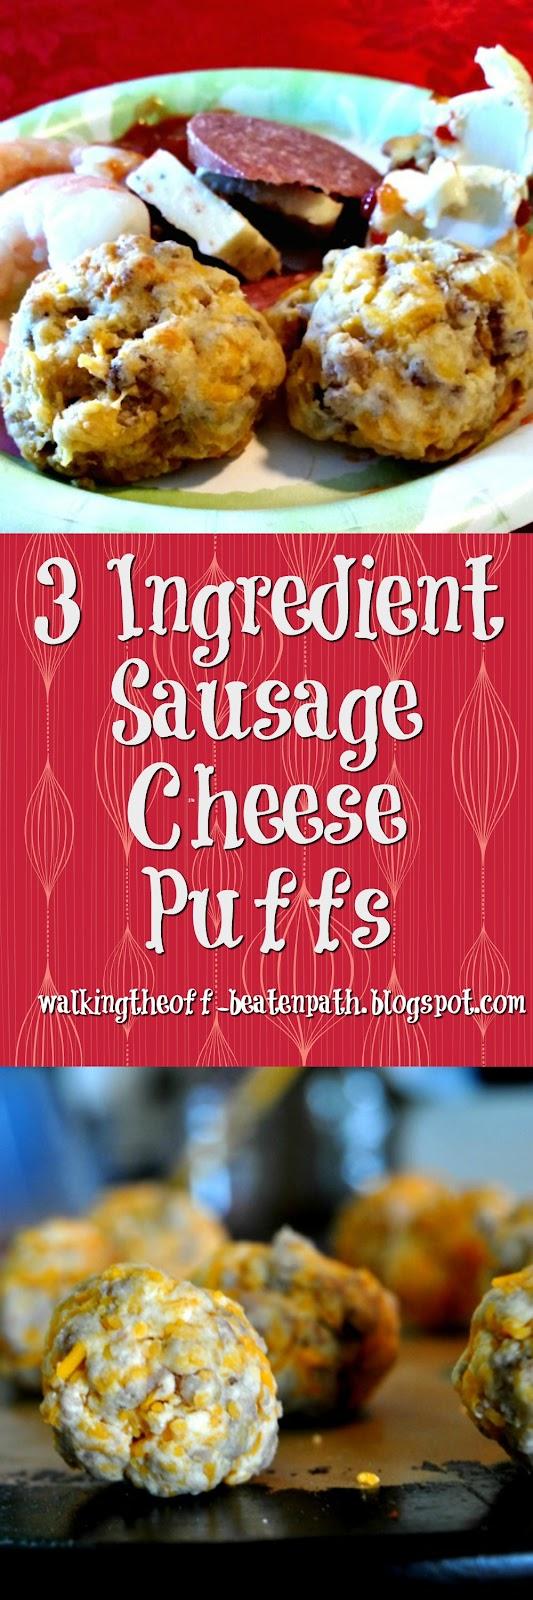 sausagecheesepuff Collage.jpg